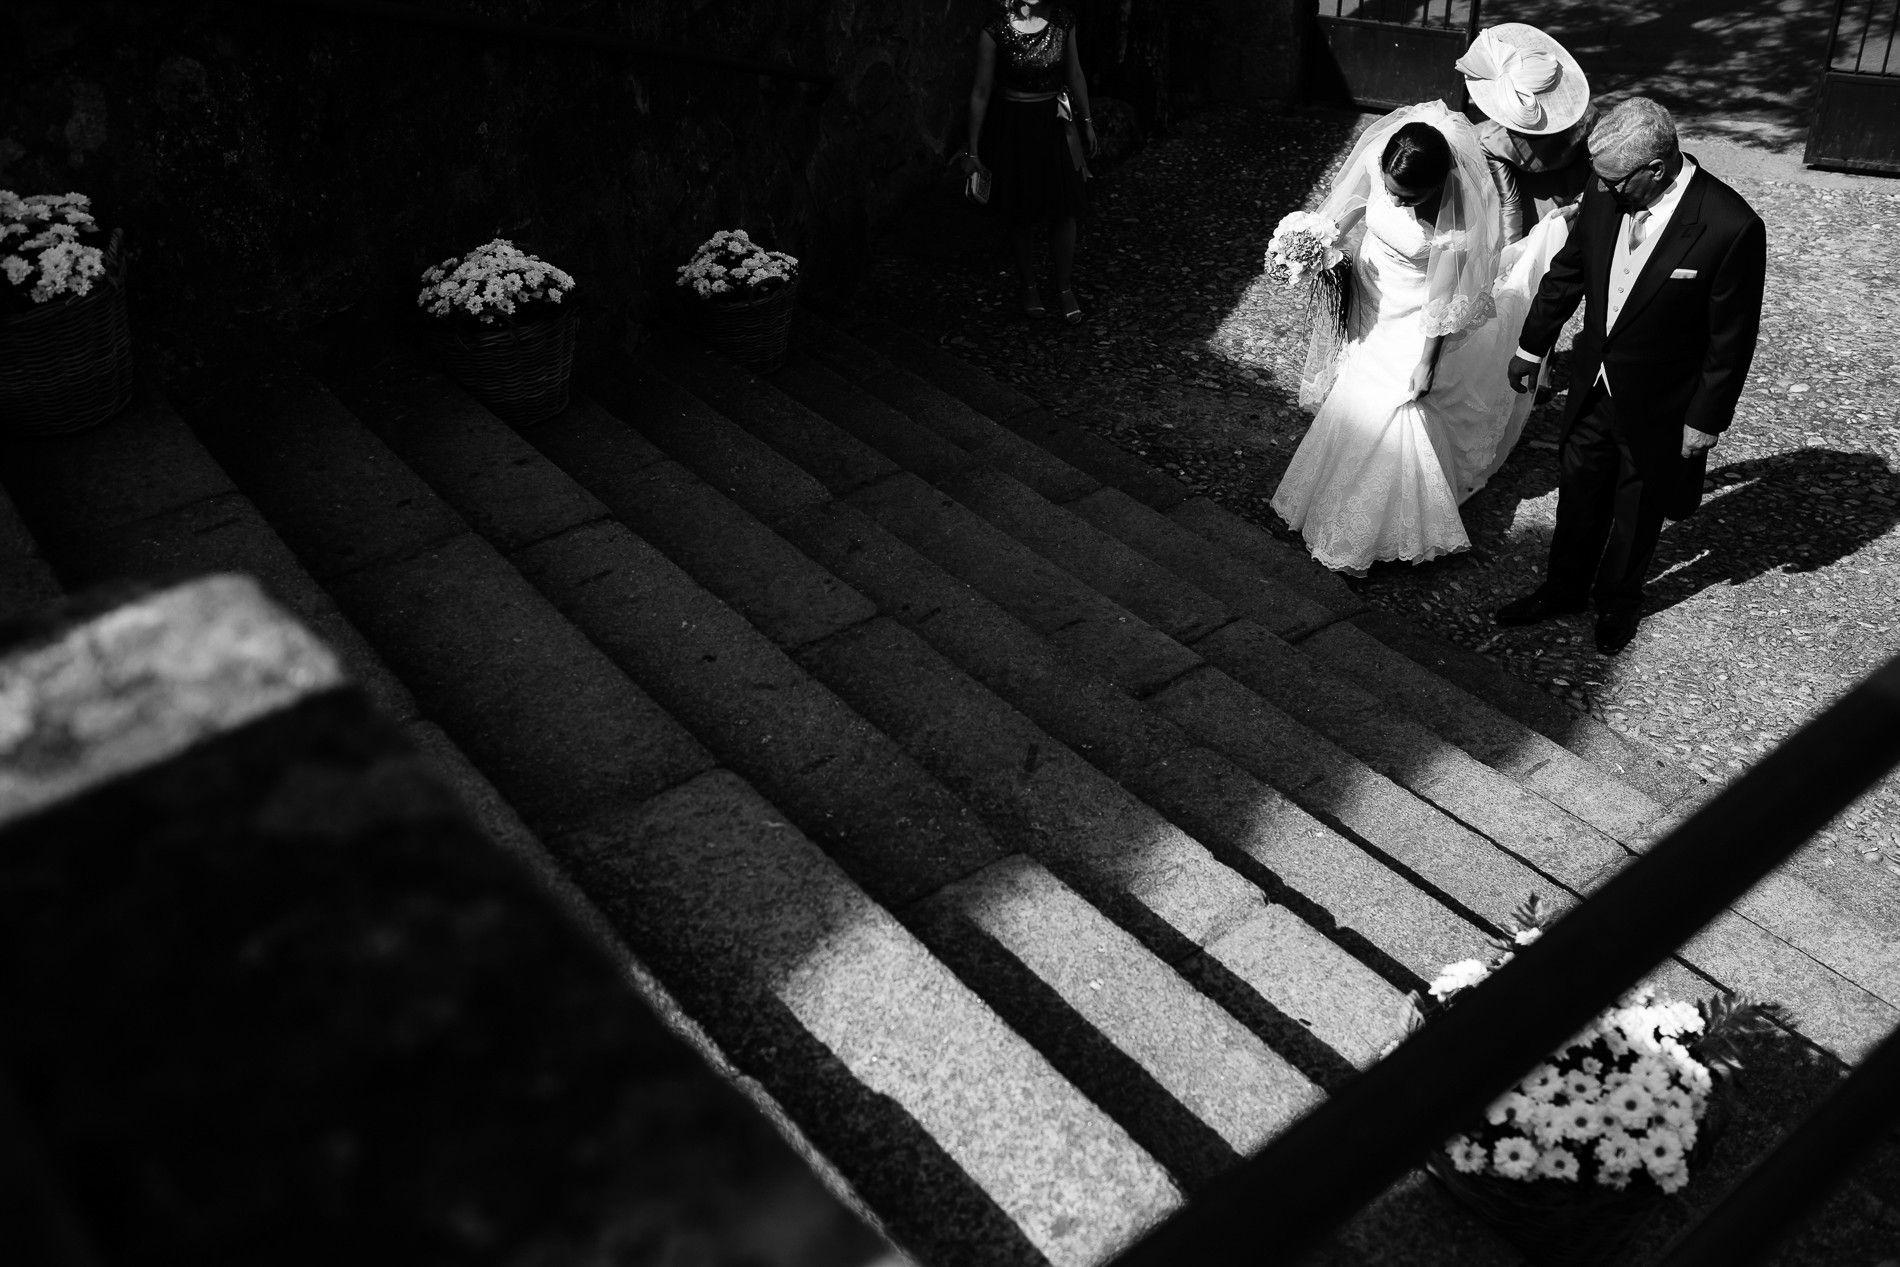 fotografo-de-boda-plasencia-16